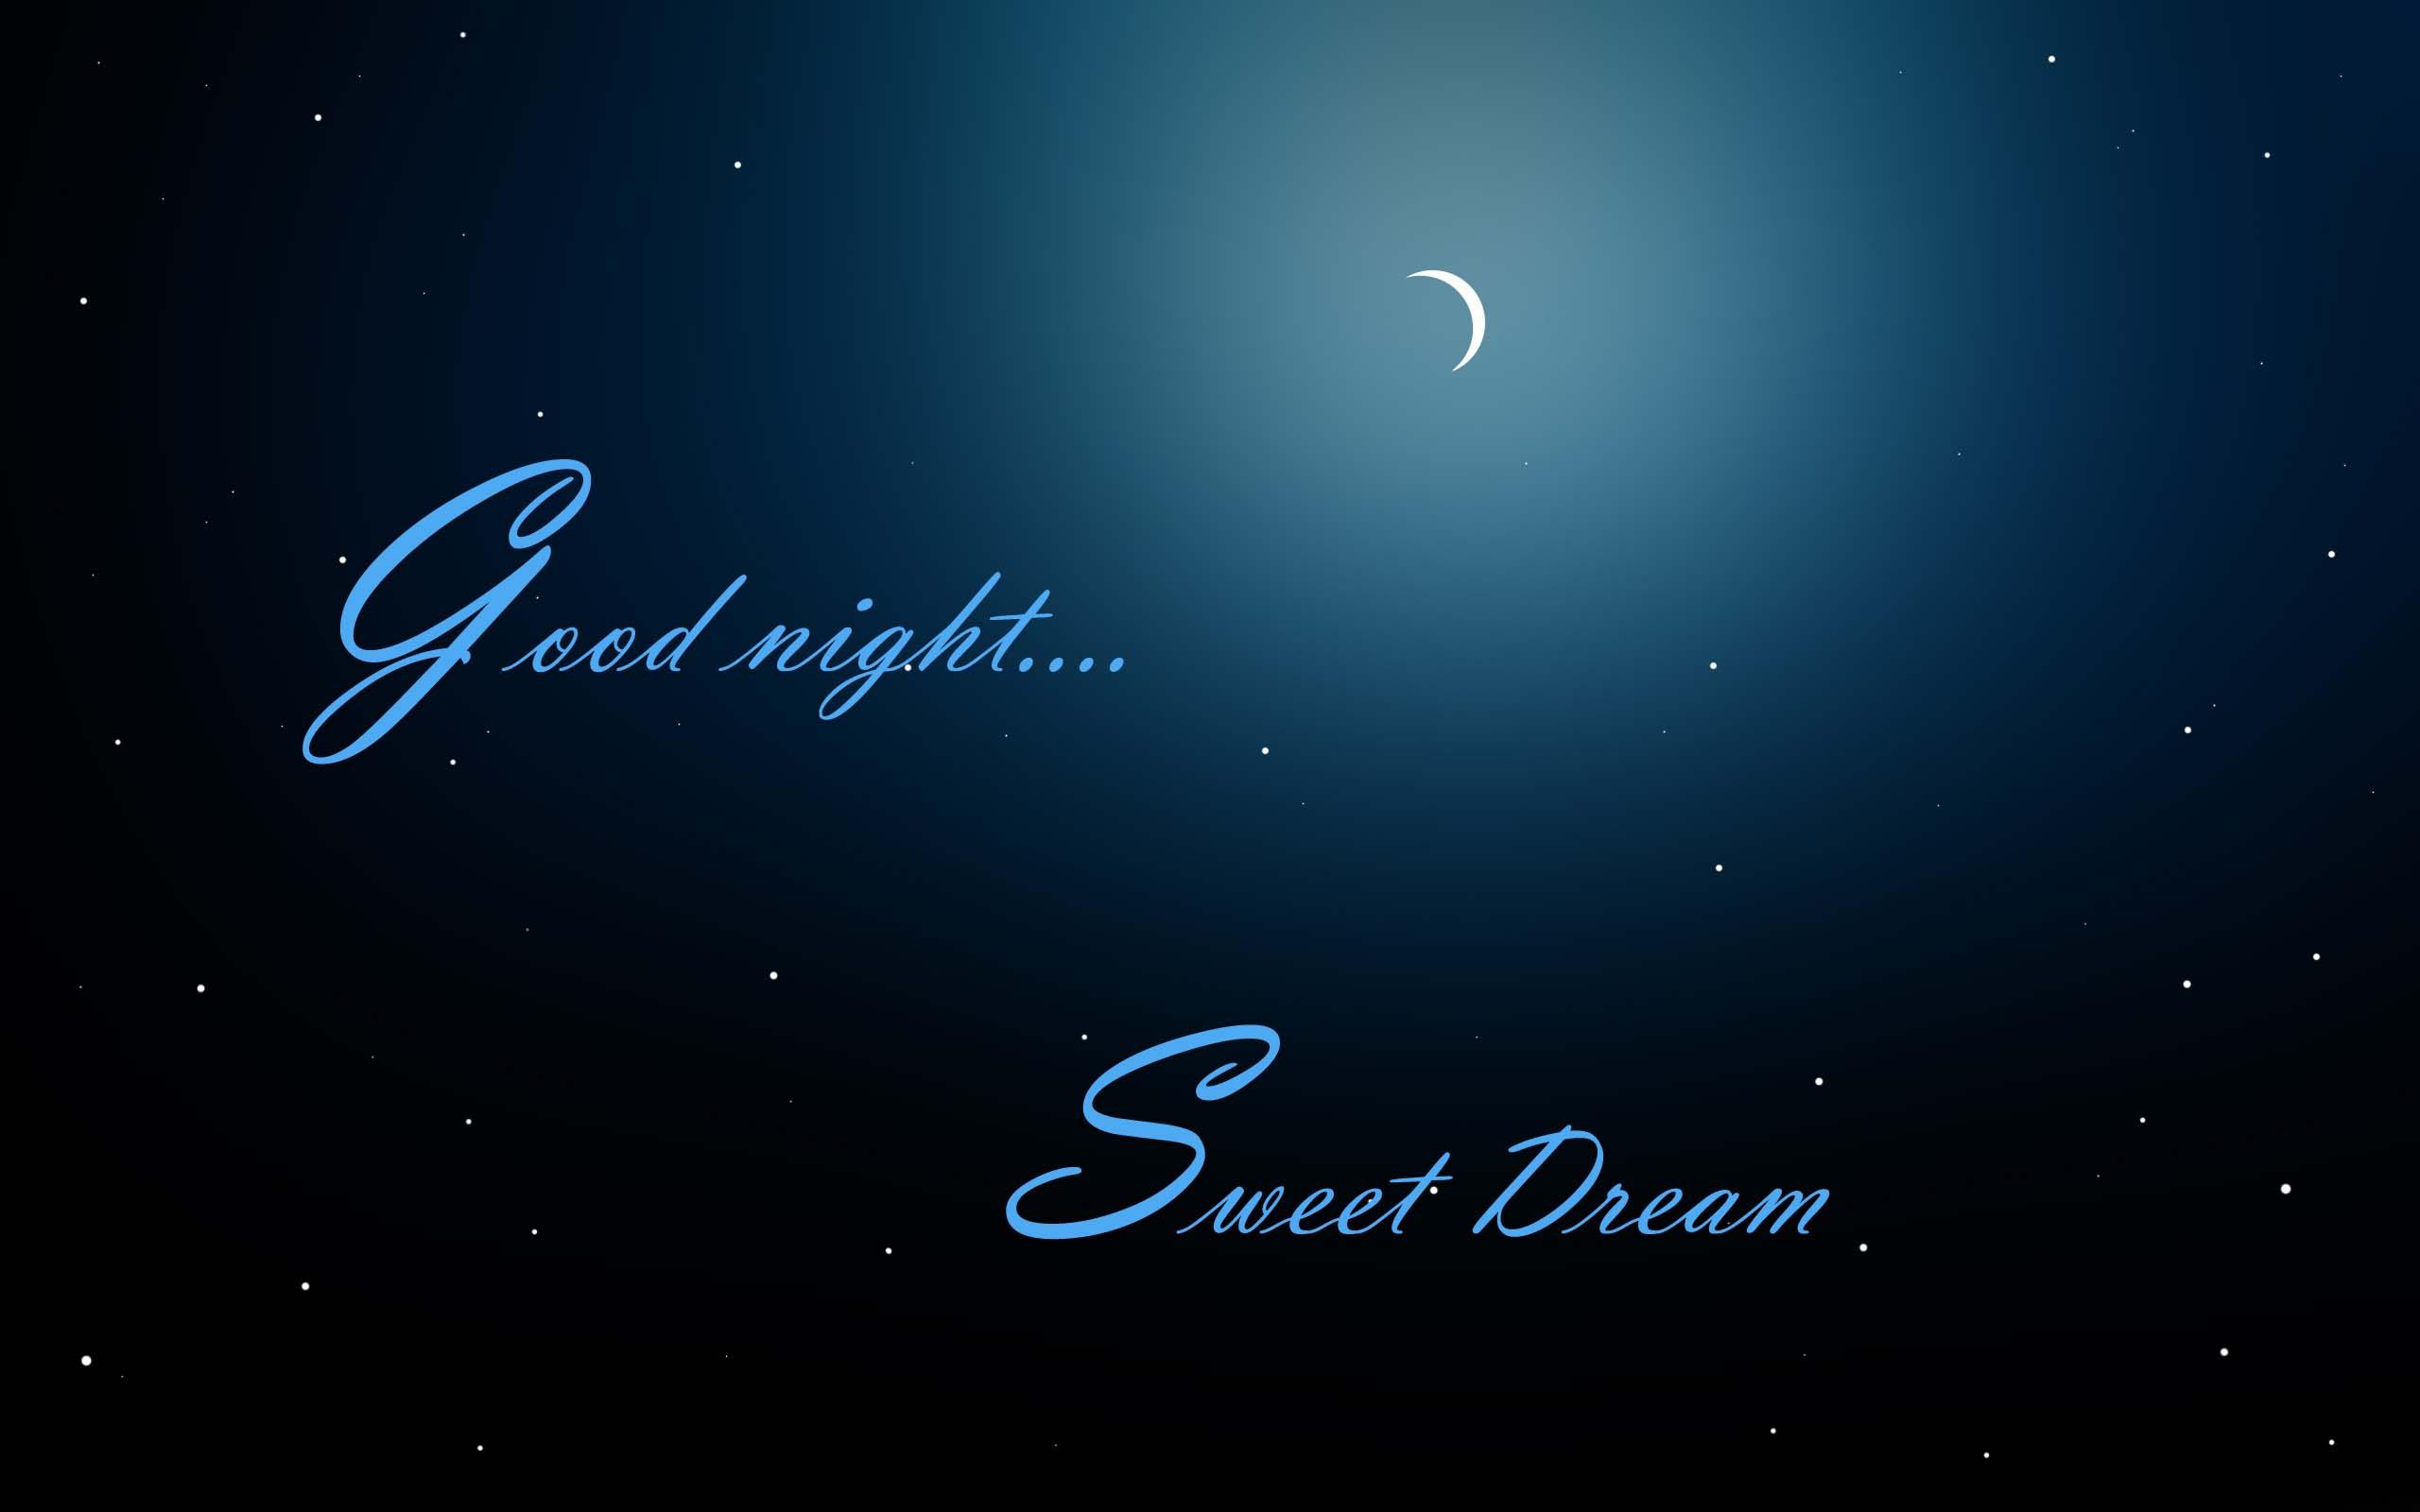 Hd wallpaper night -  Good Night Wallpaper